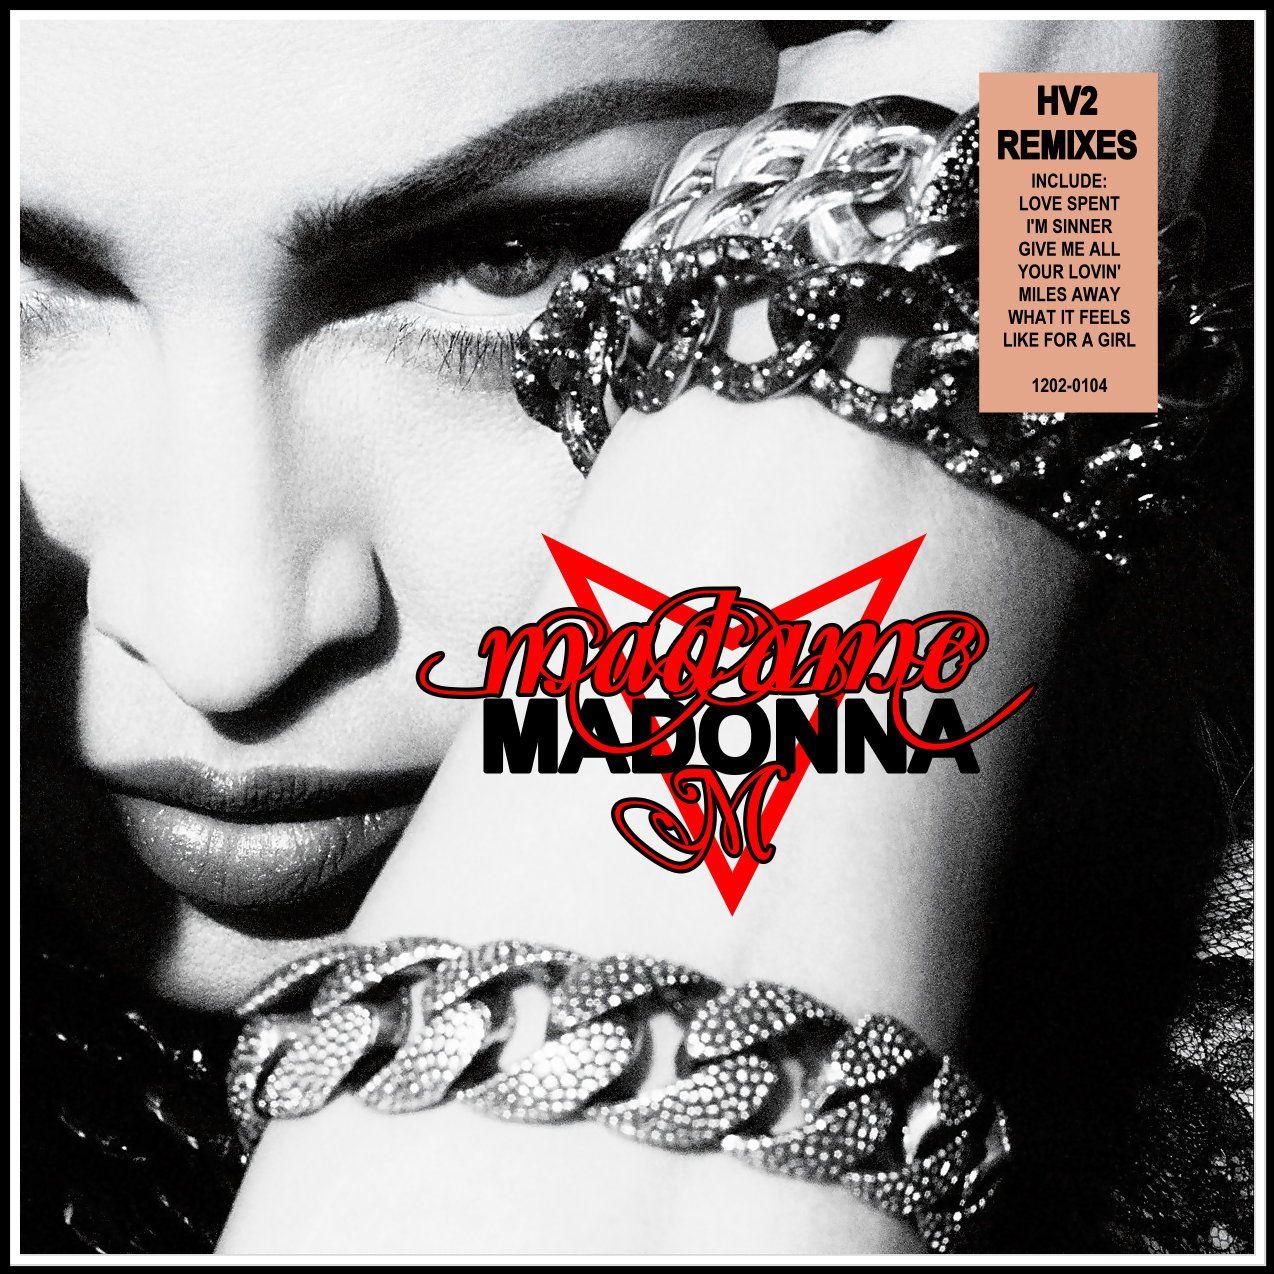 HV2 remixes adamanton madonna madamam